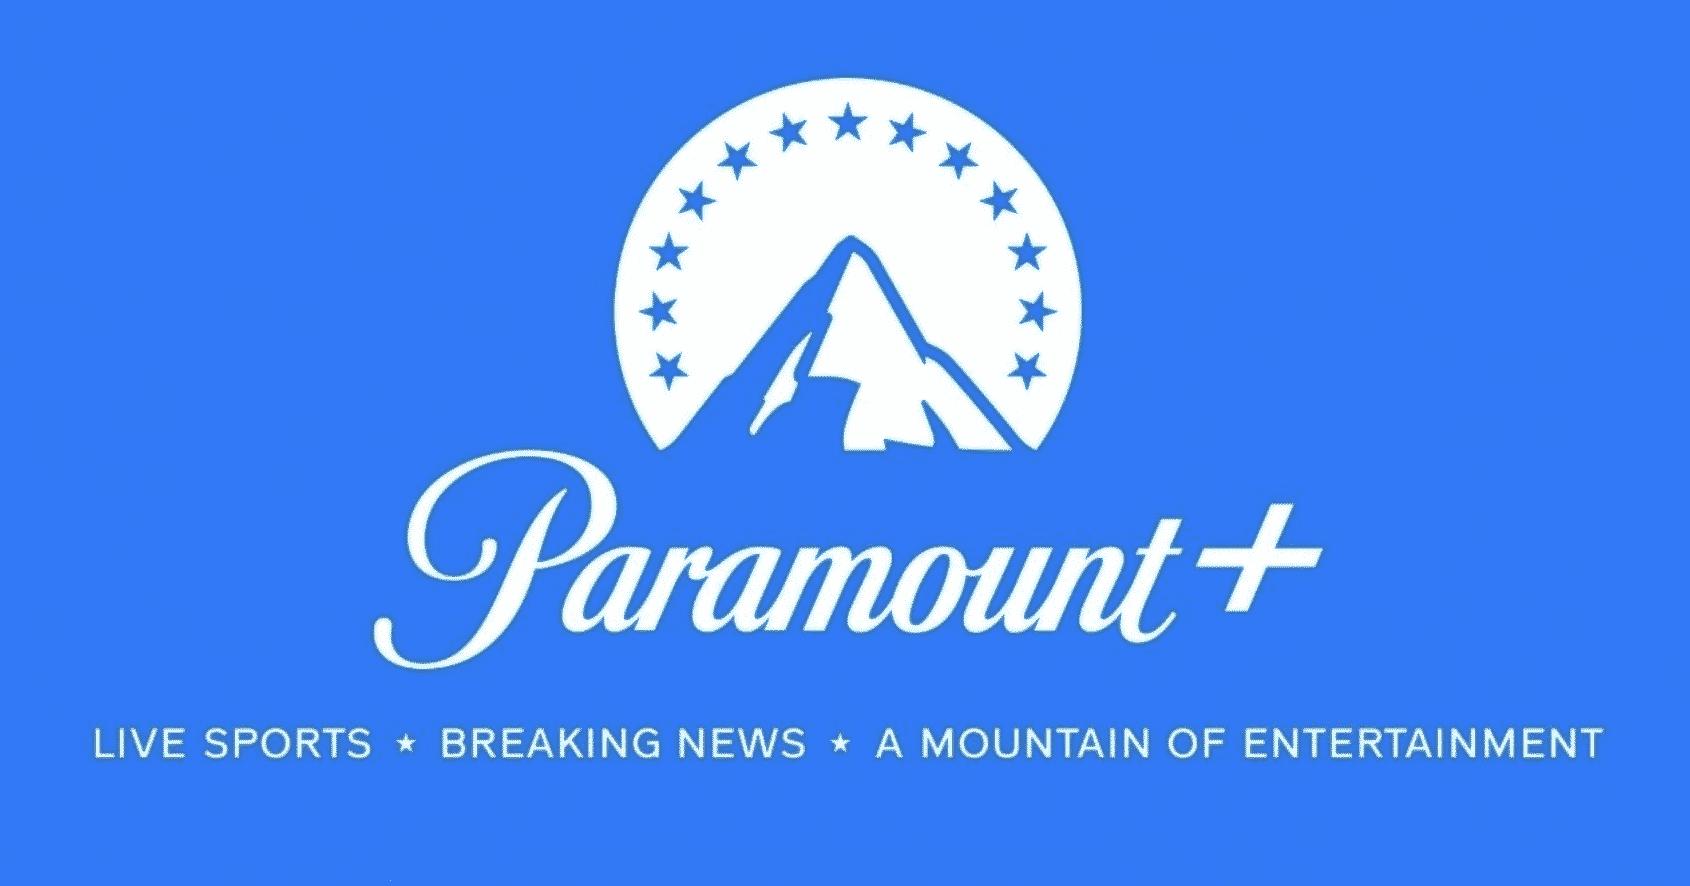 Apple TV Users Free Paramount+